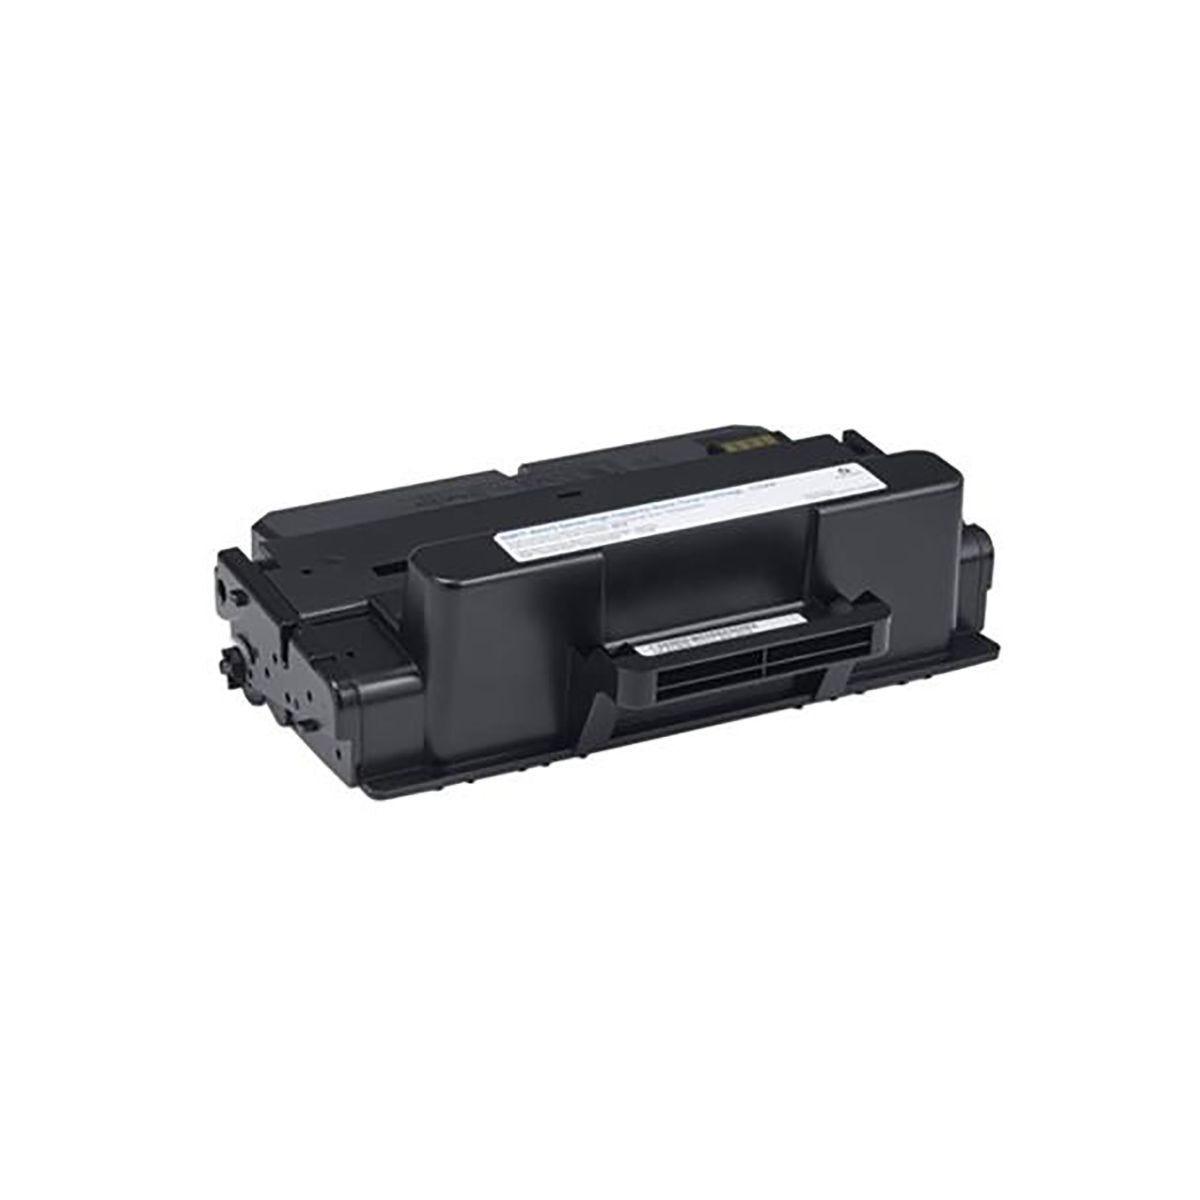 Dell B2375dfw Black Toner Standard